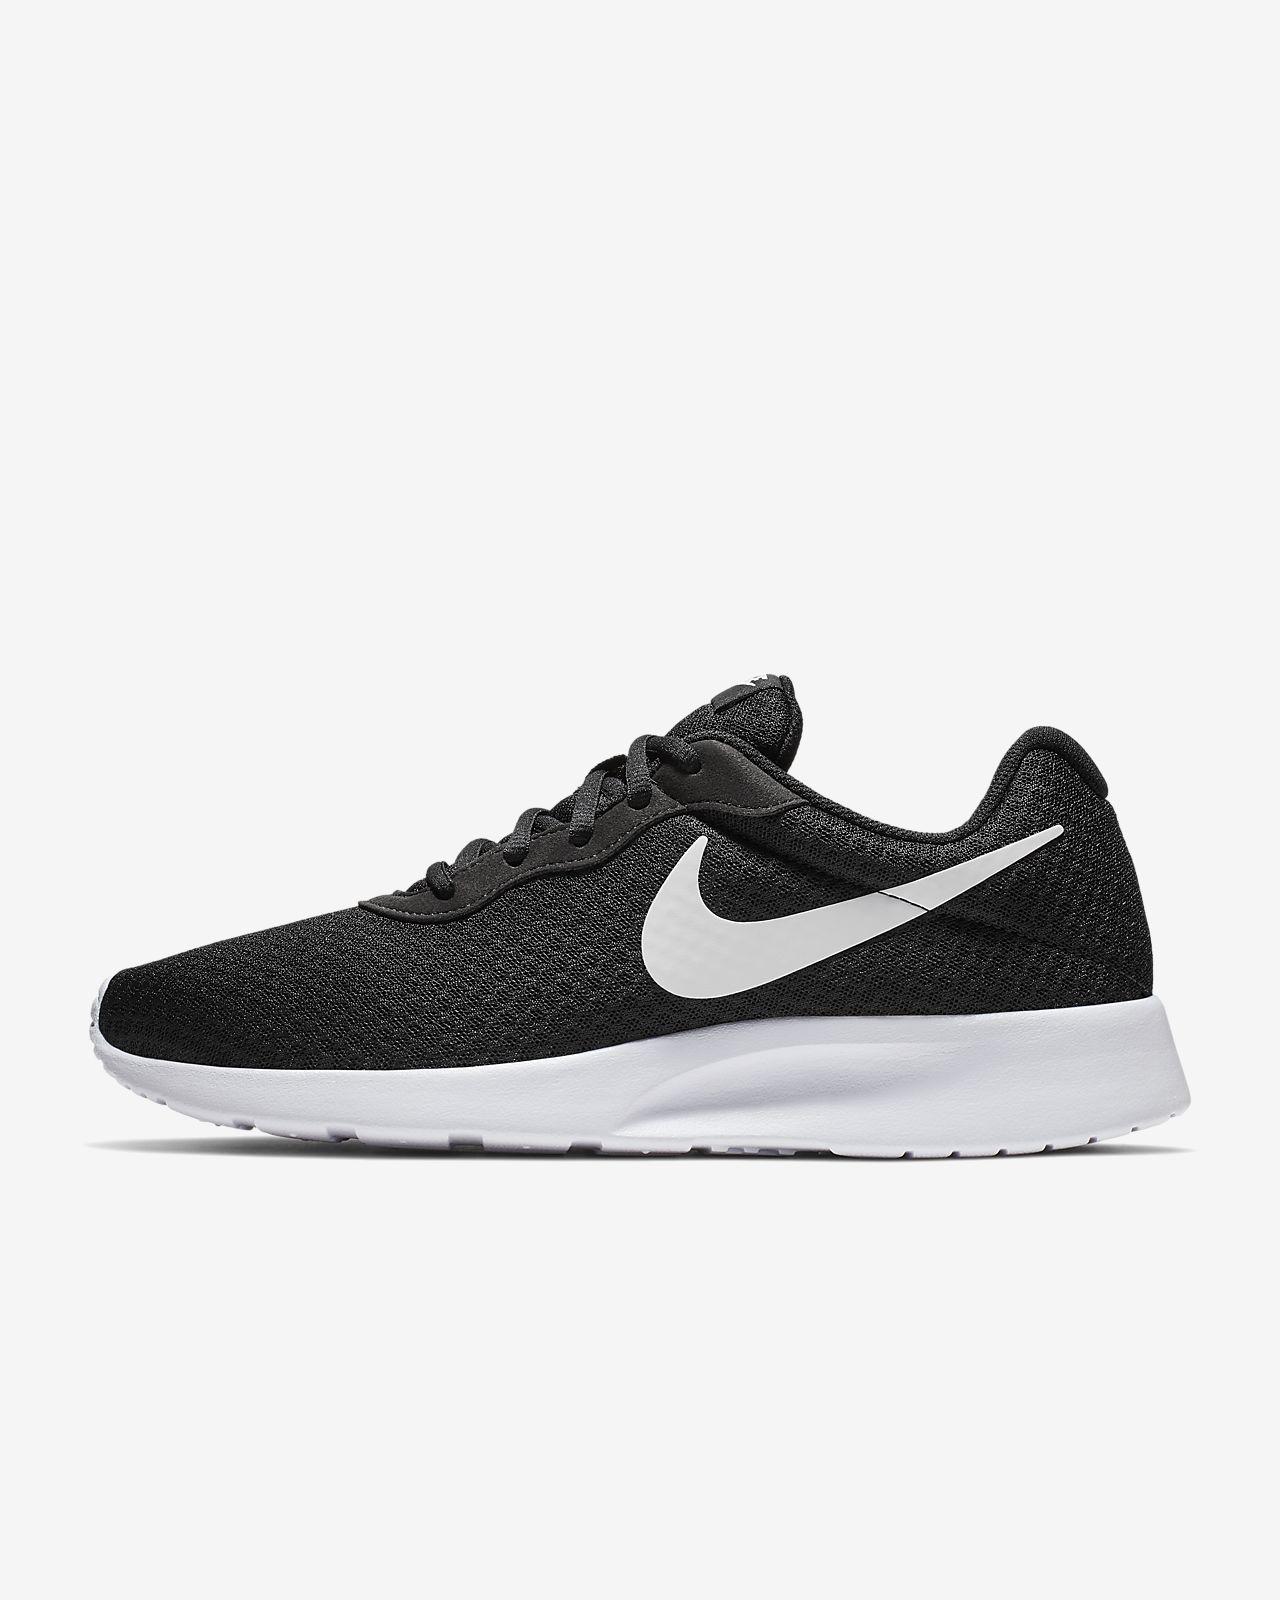 93f8b88ff Low Resolution Мужские кроссовки Nike Tanjun Мужские кроссовки Nike Tanjun